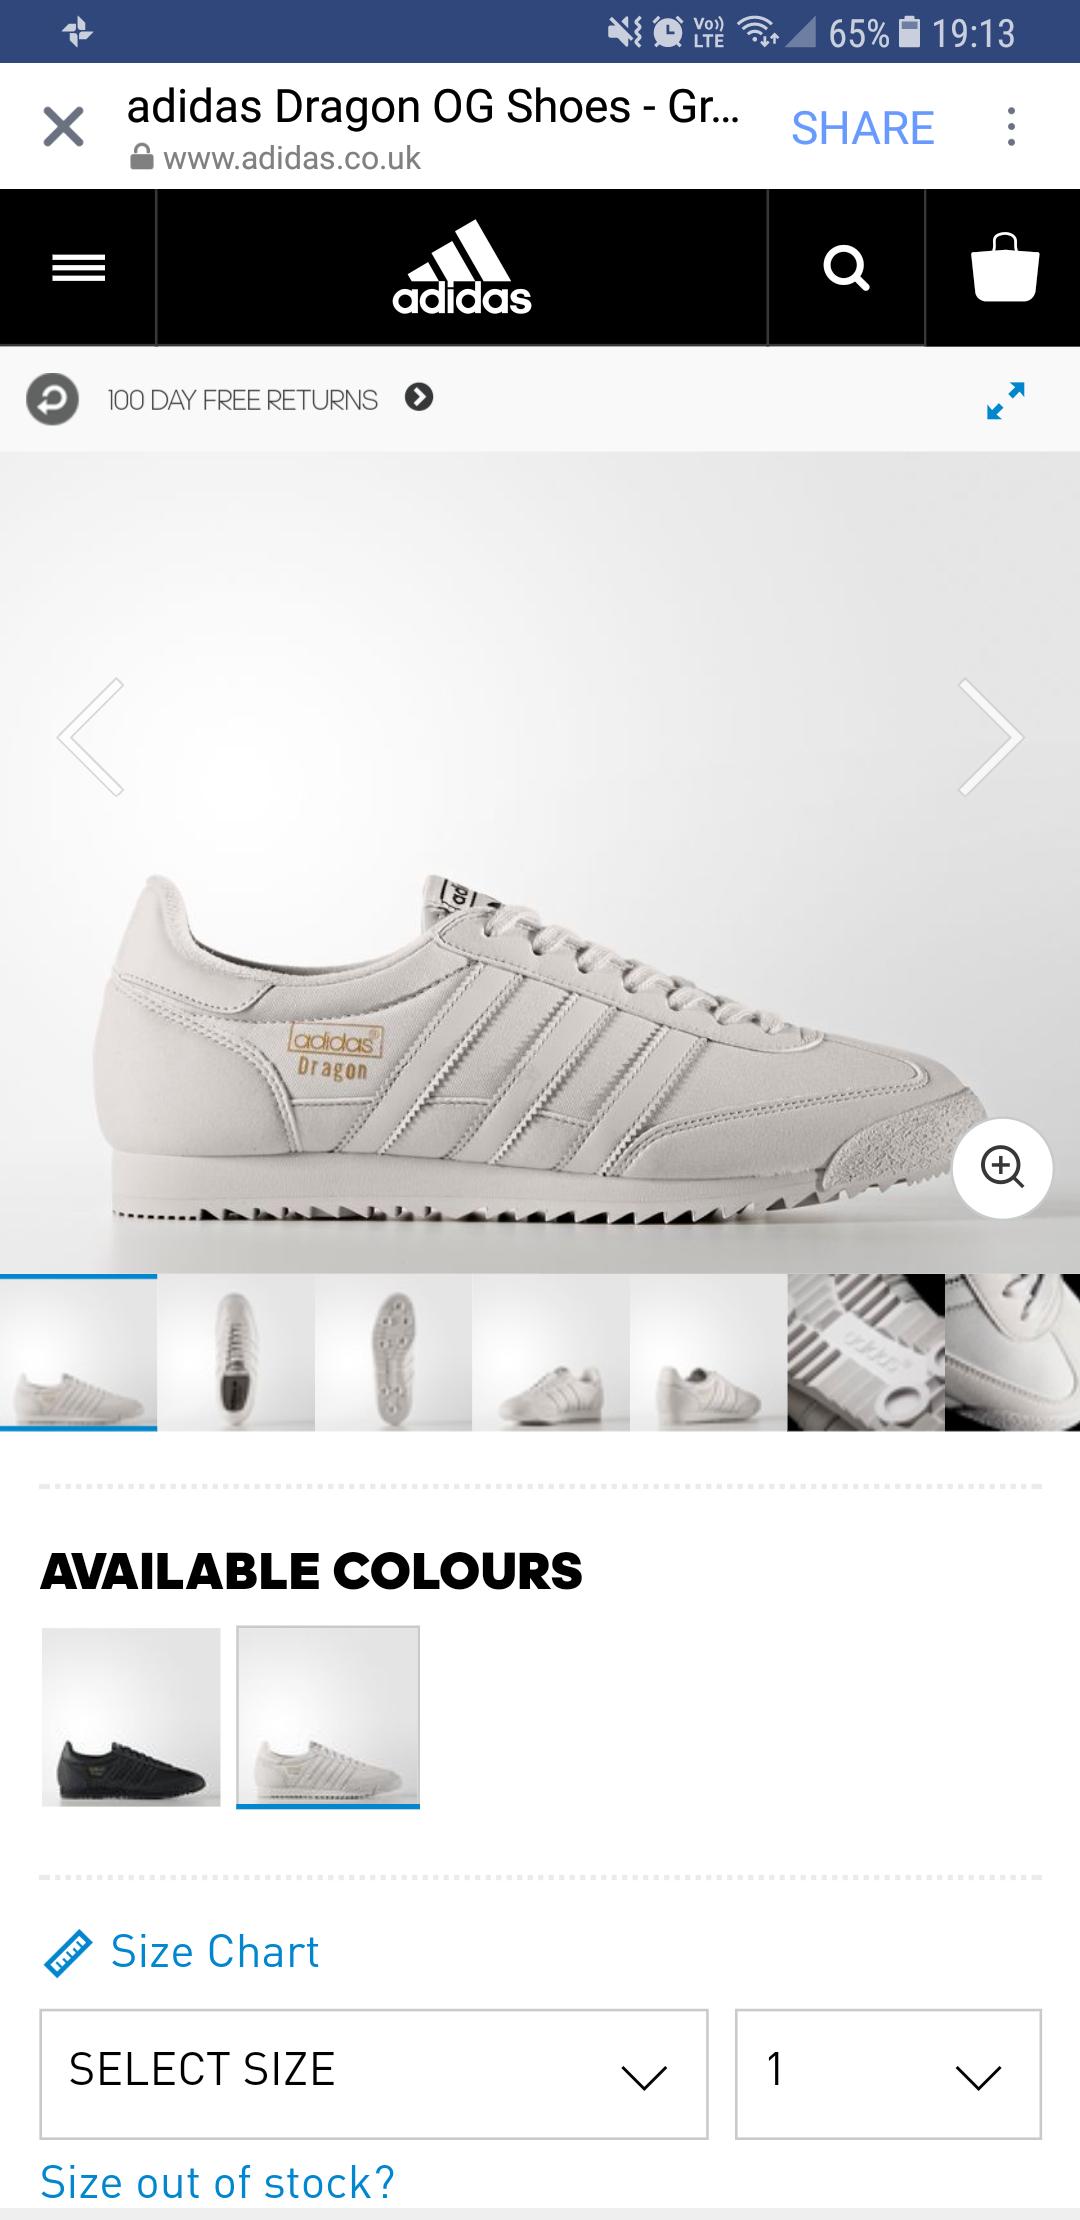 Adidas DRAGON OG SHOES - £34.98 @ Adidas (£3.95 del or free C&C)